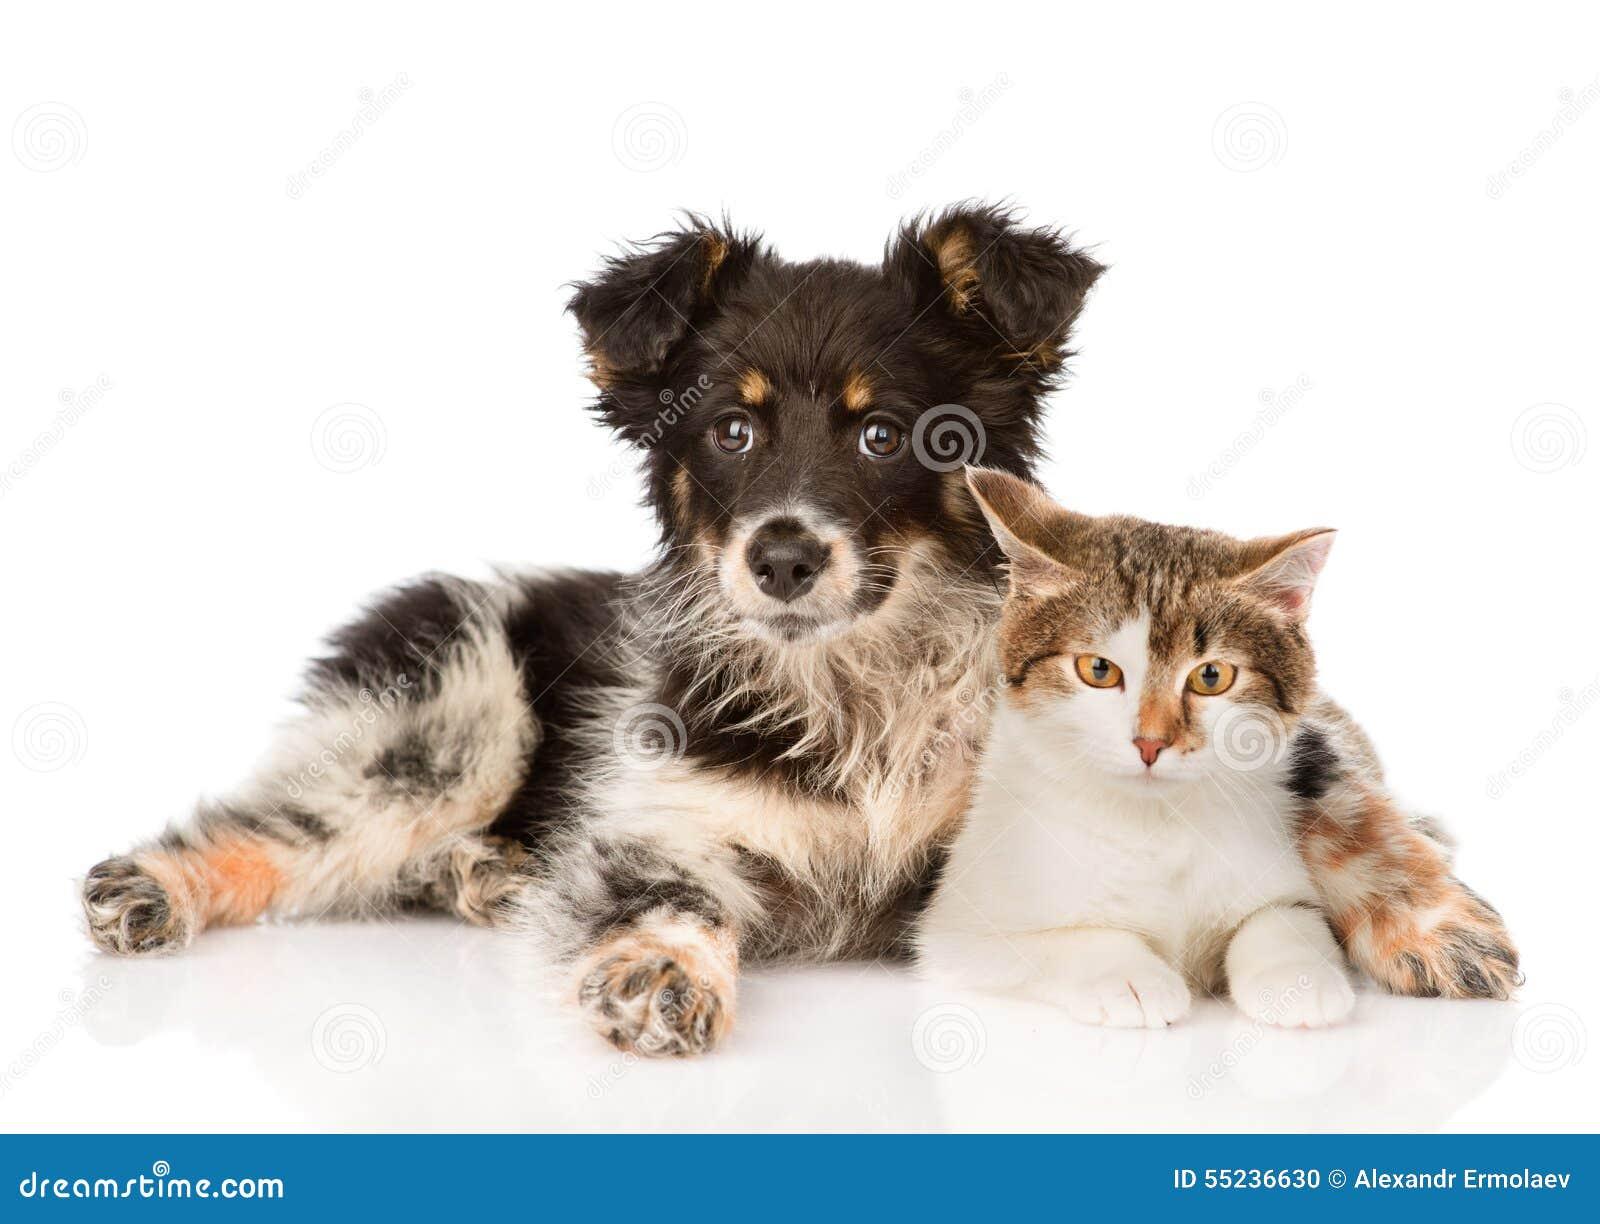 Hug Dog Breed Puppy